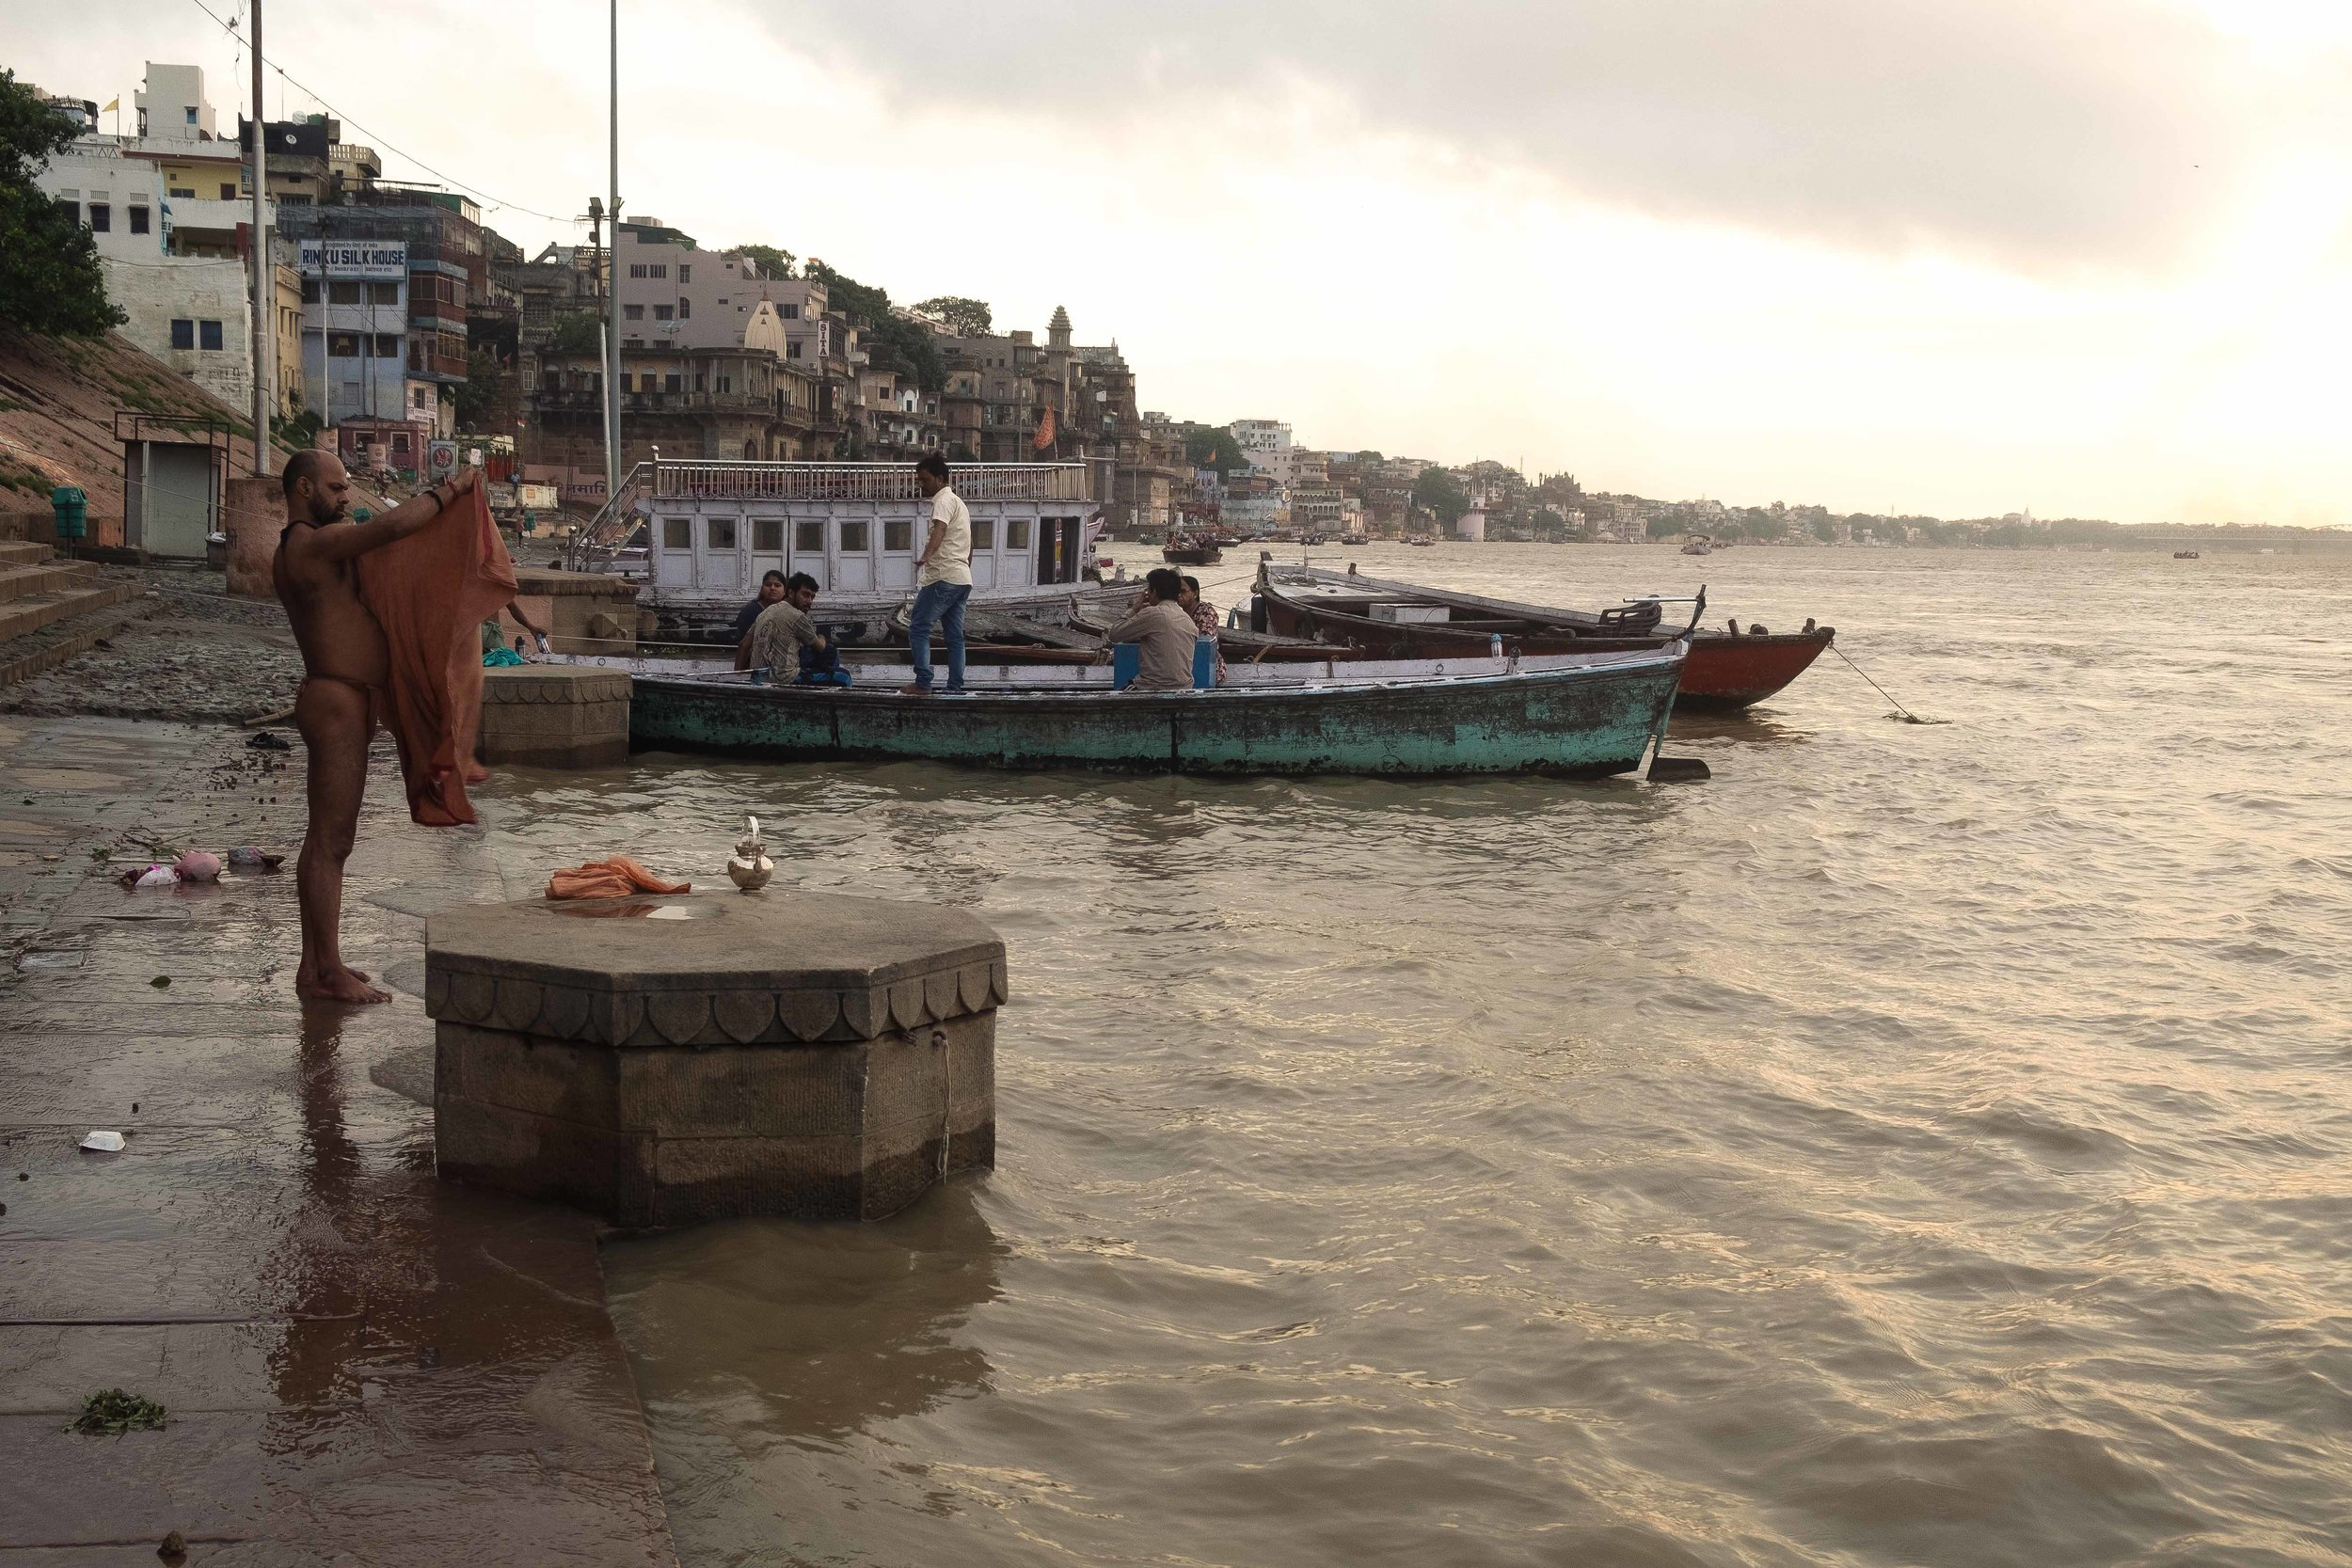 Varanasi, India, 2018